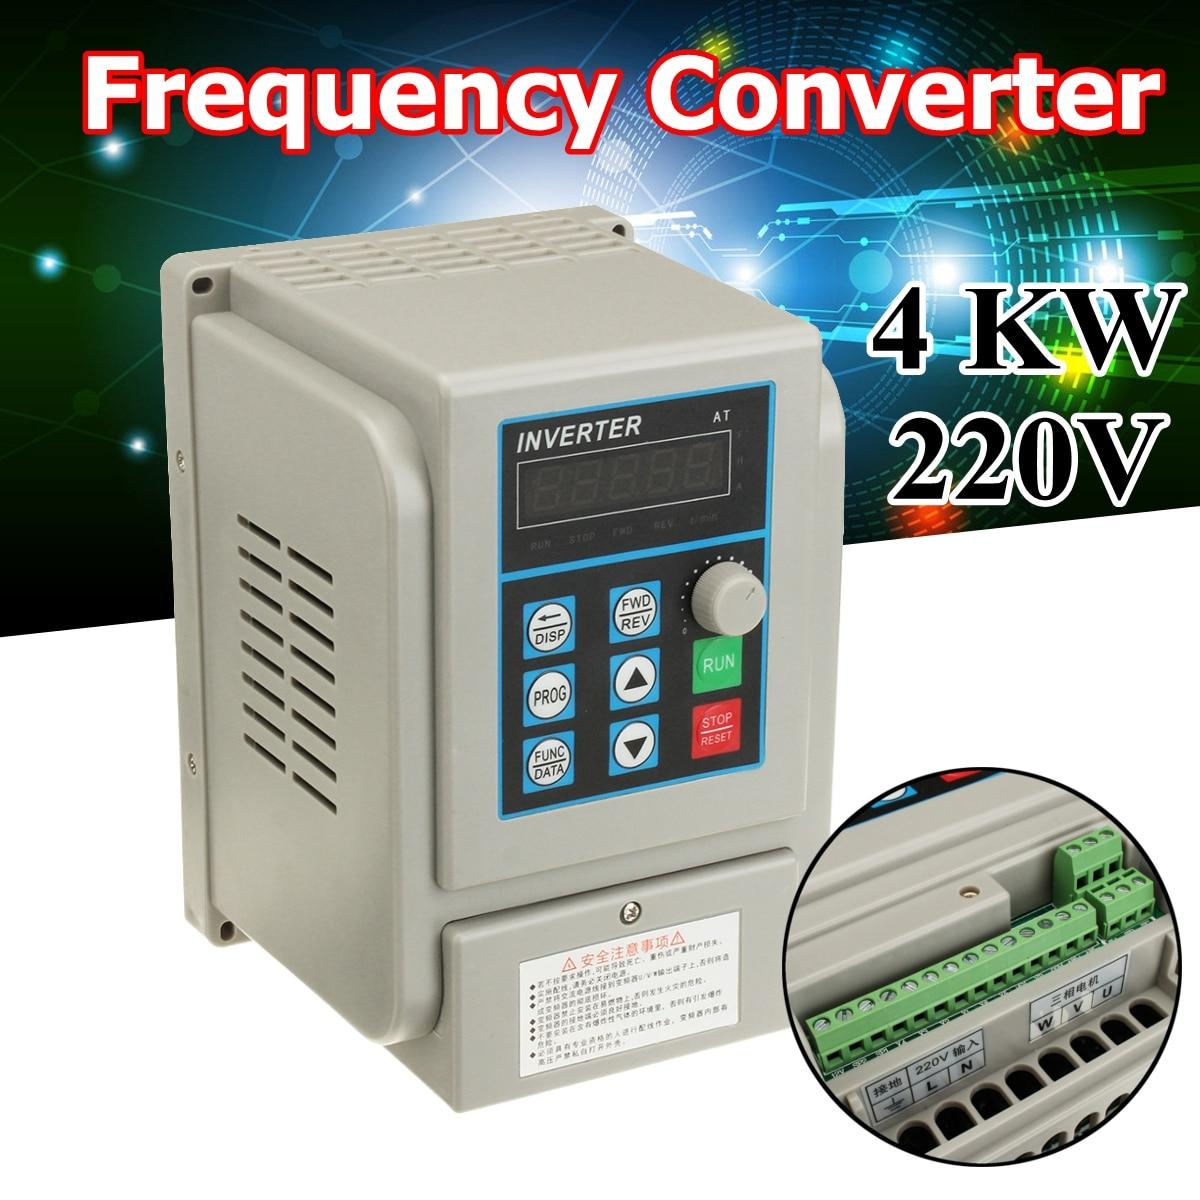 все цены на AC 220V Frequency Converter 4KW Variable Frequency Drive Converter VFD Speed Controller Converter онлайн